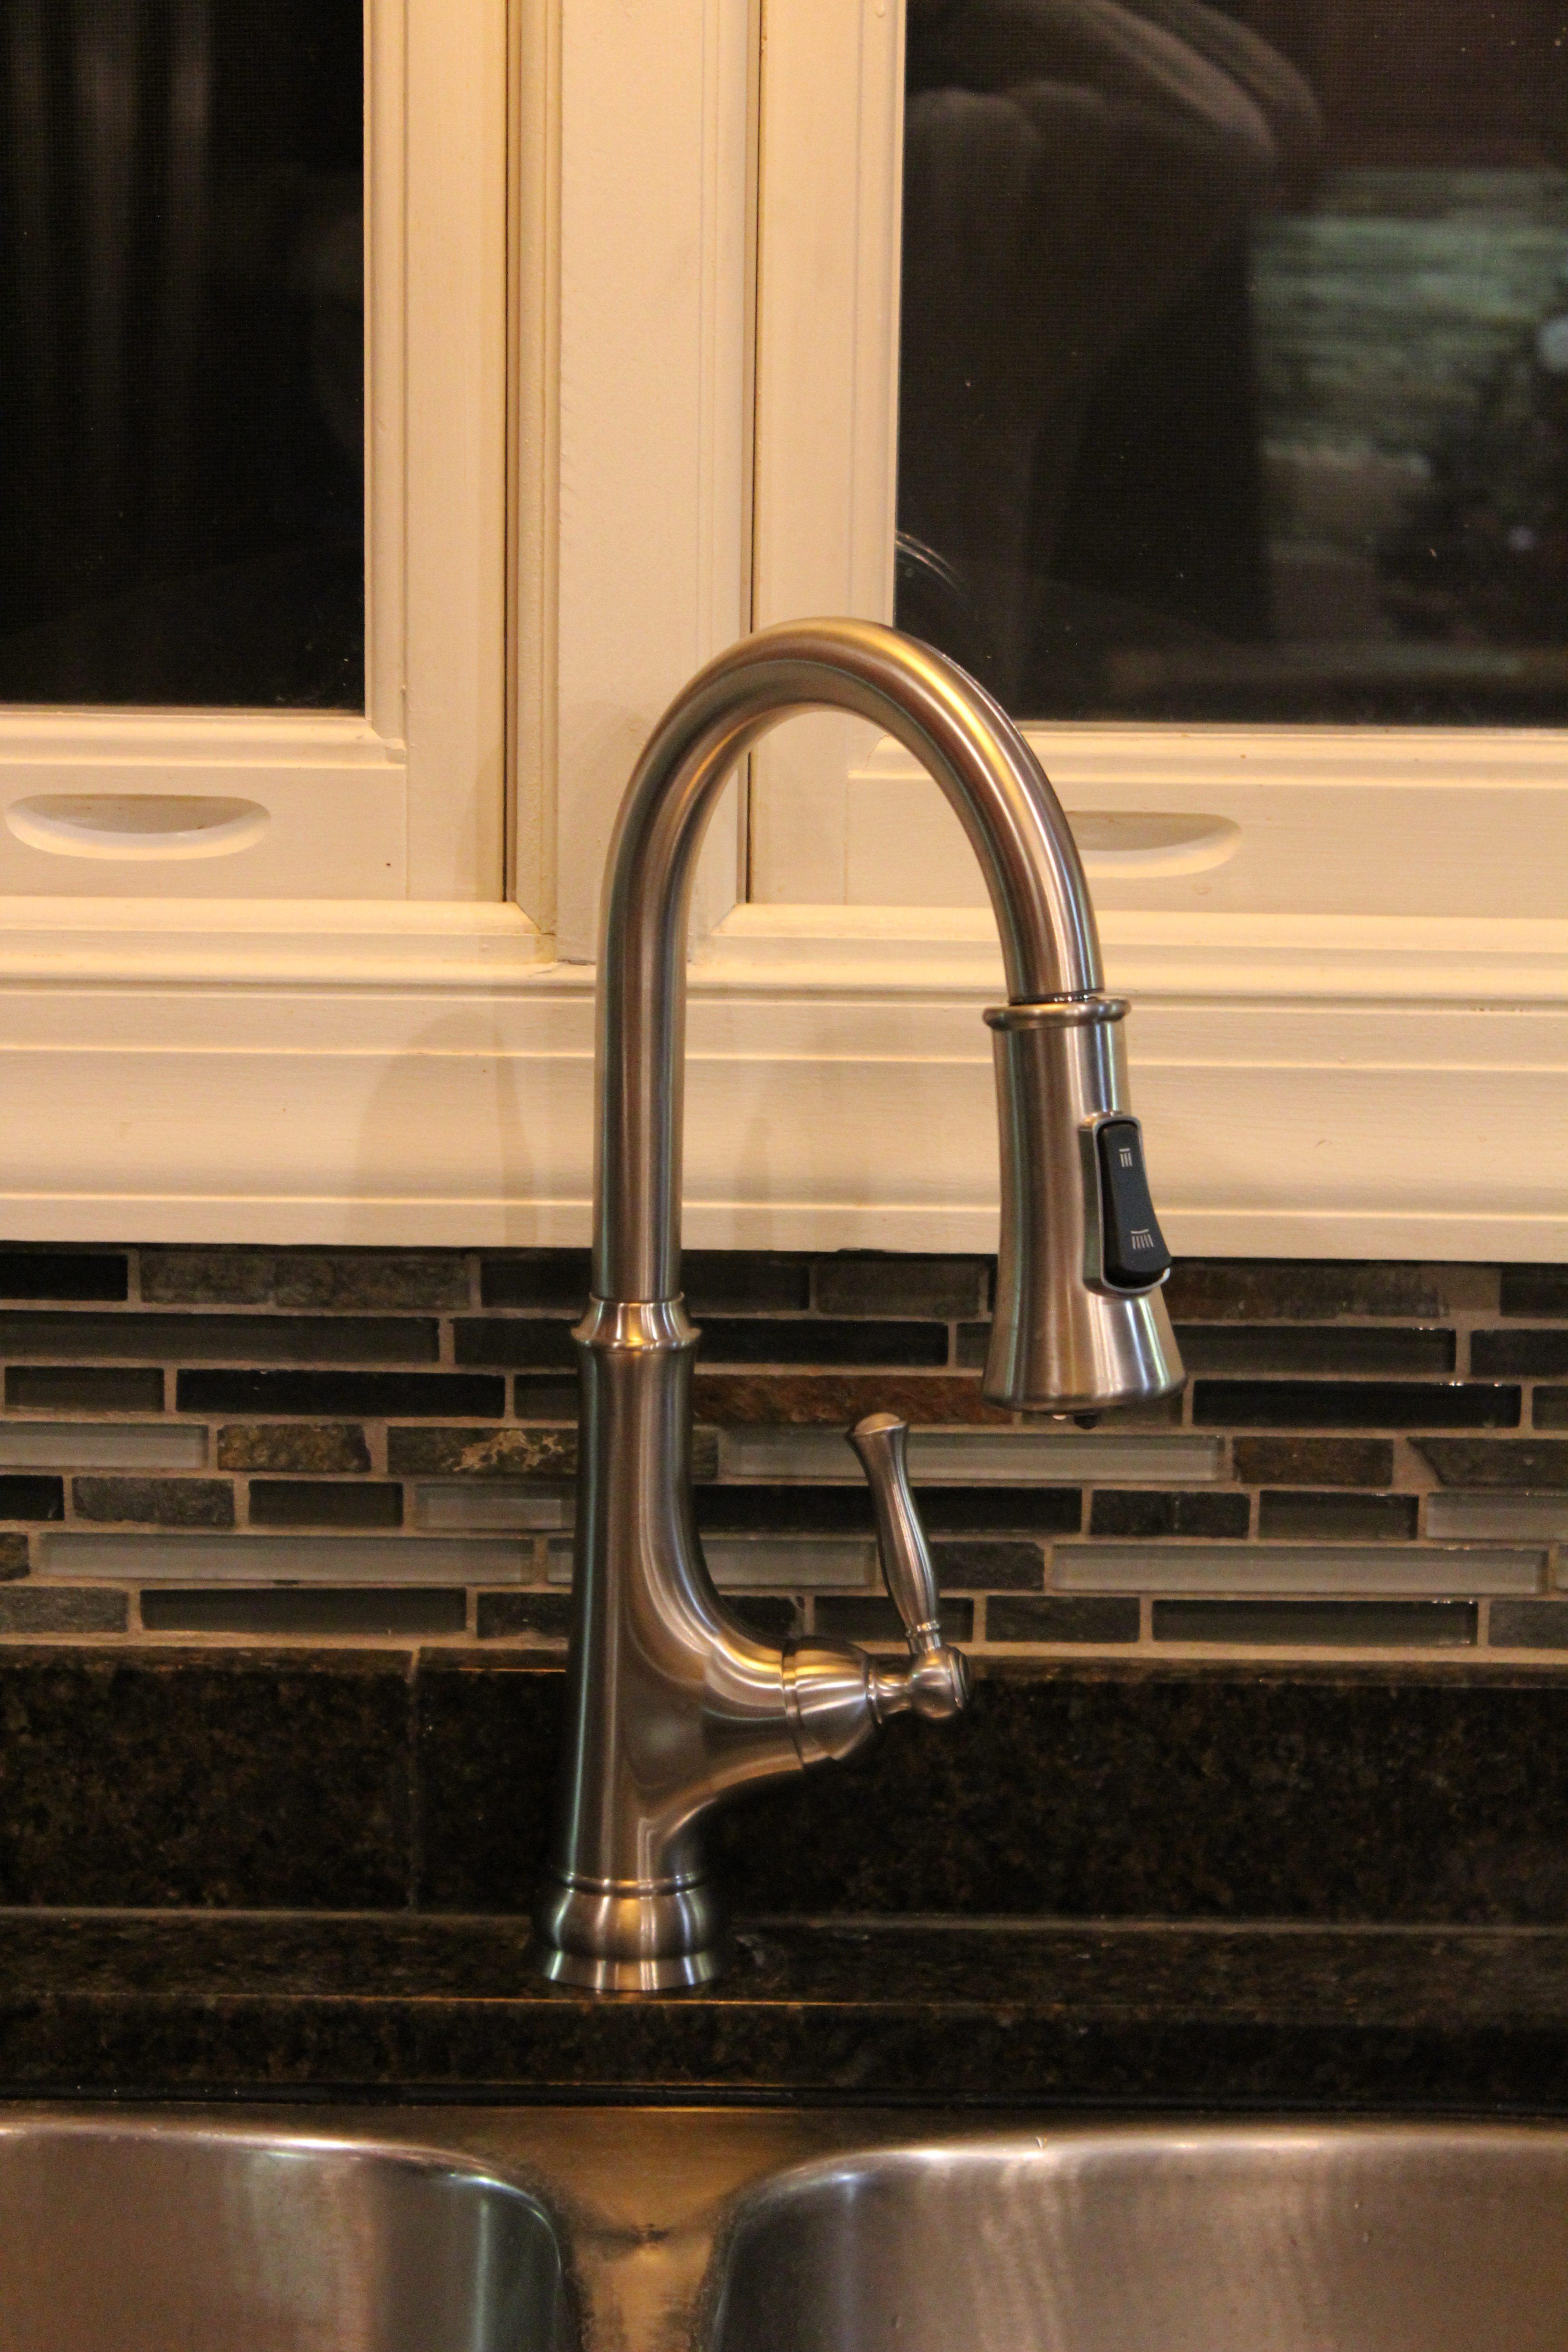 Glacier Bay Pull-Down Kitchen Faucet – dells daily dish